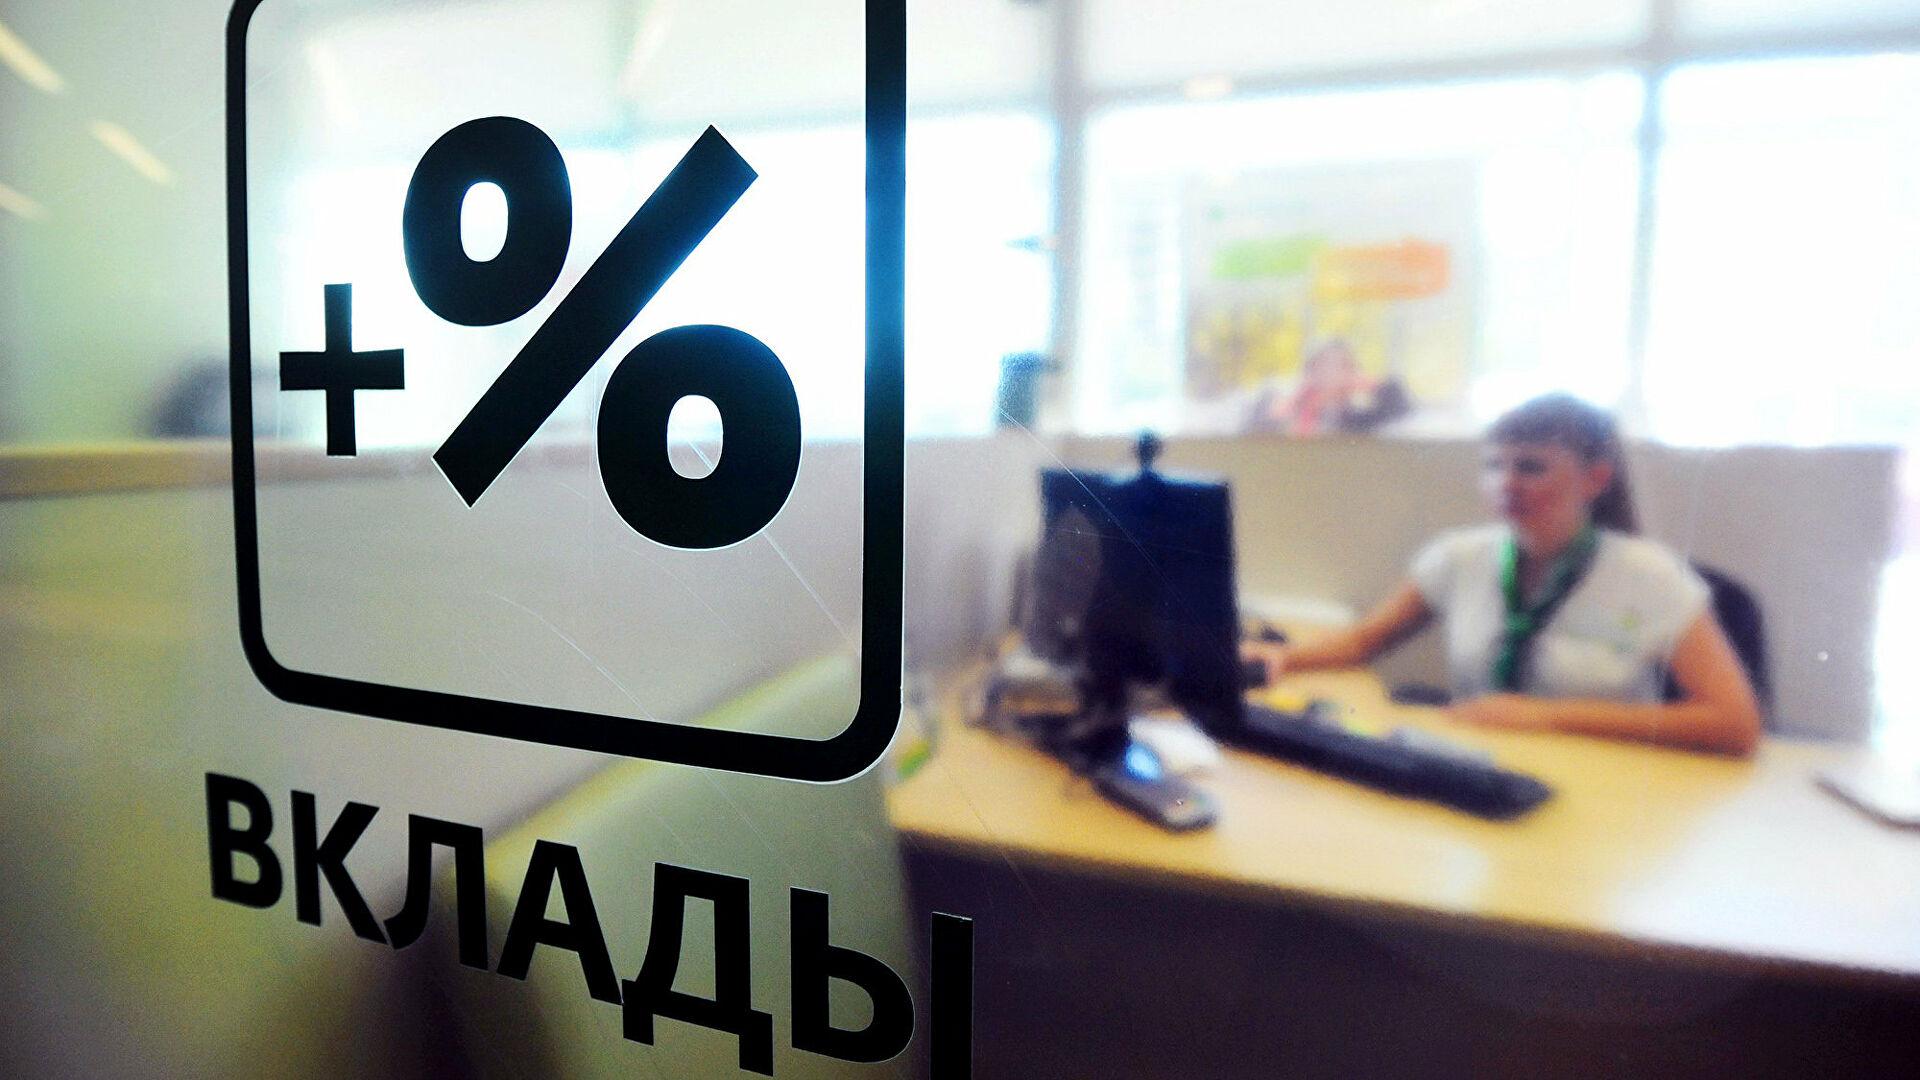 Финансист предупредил об угрозе банковским вкладам